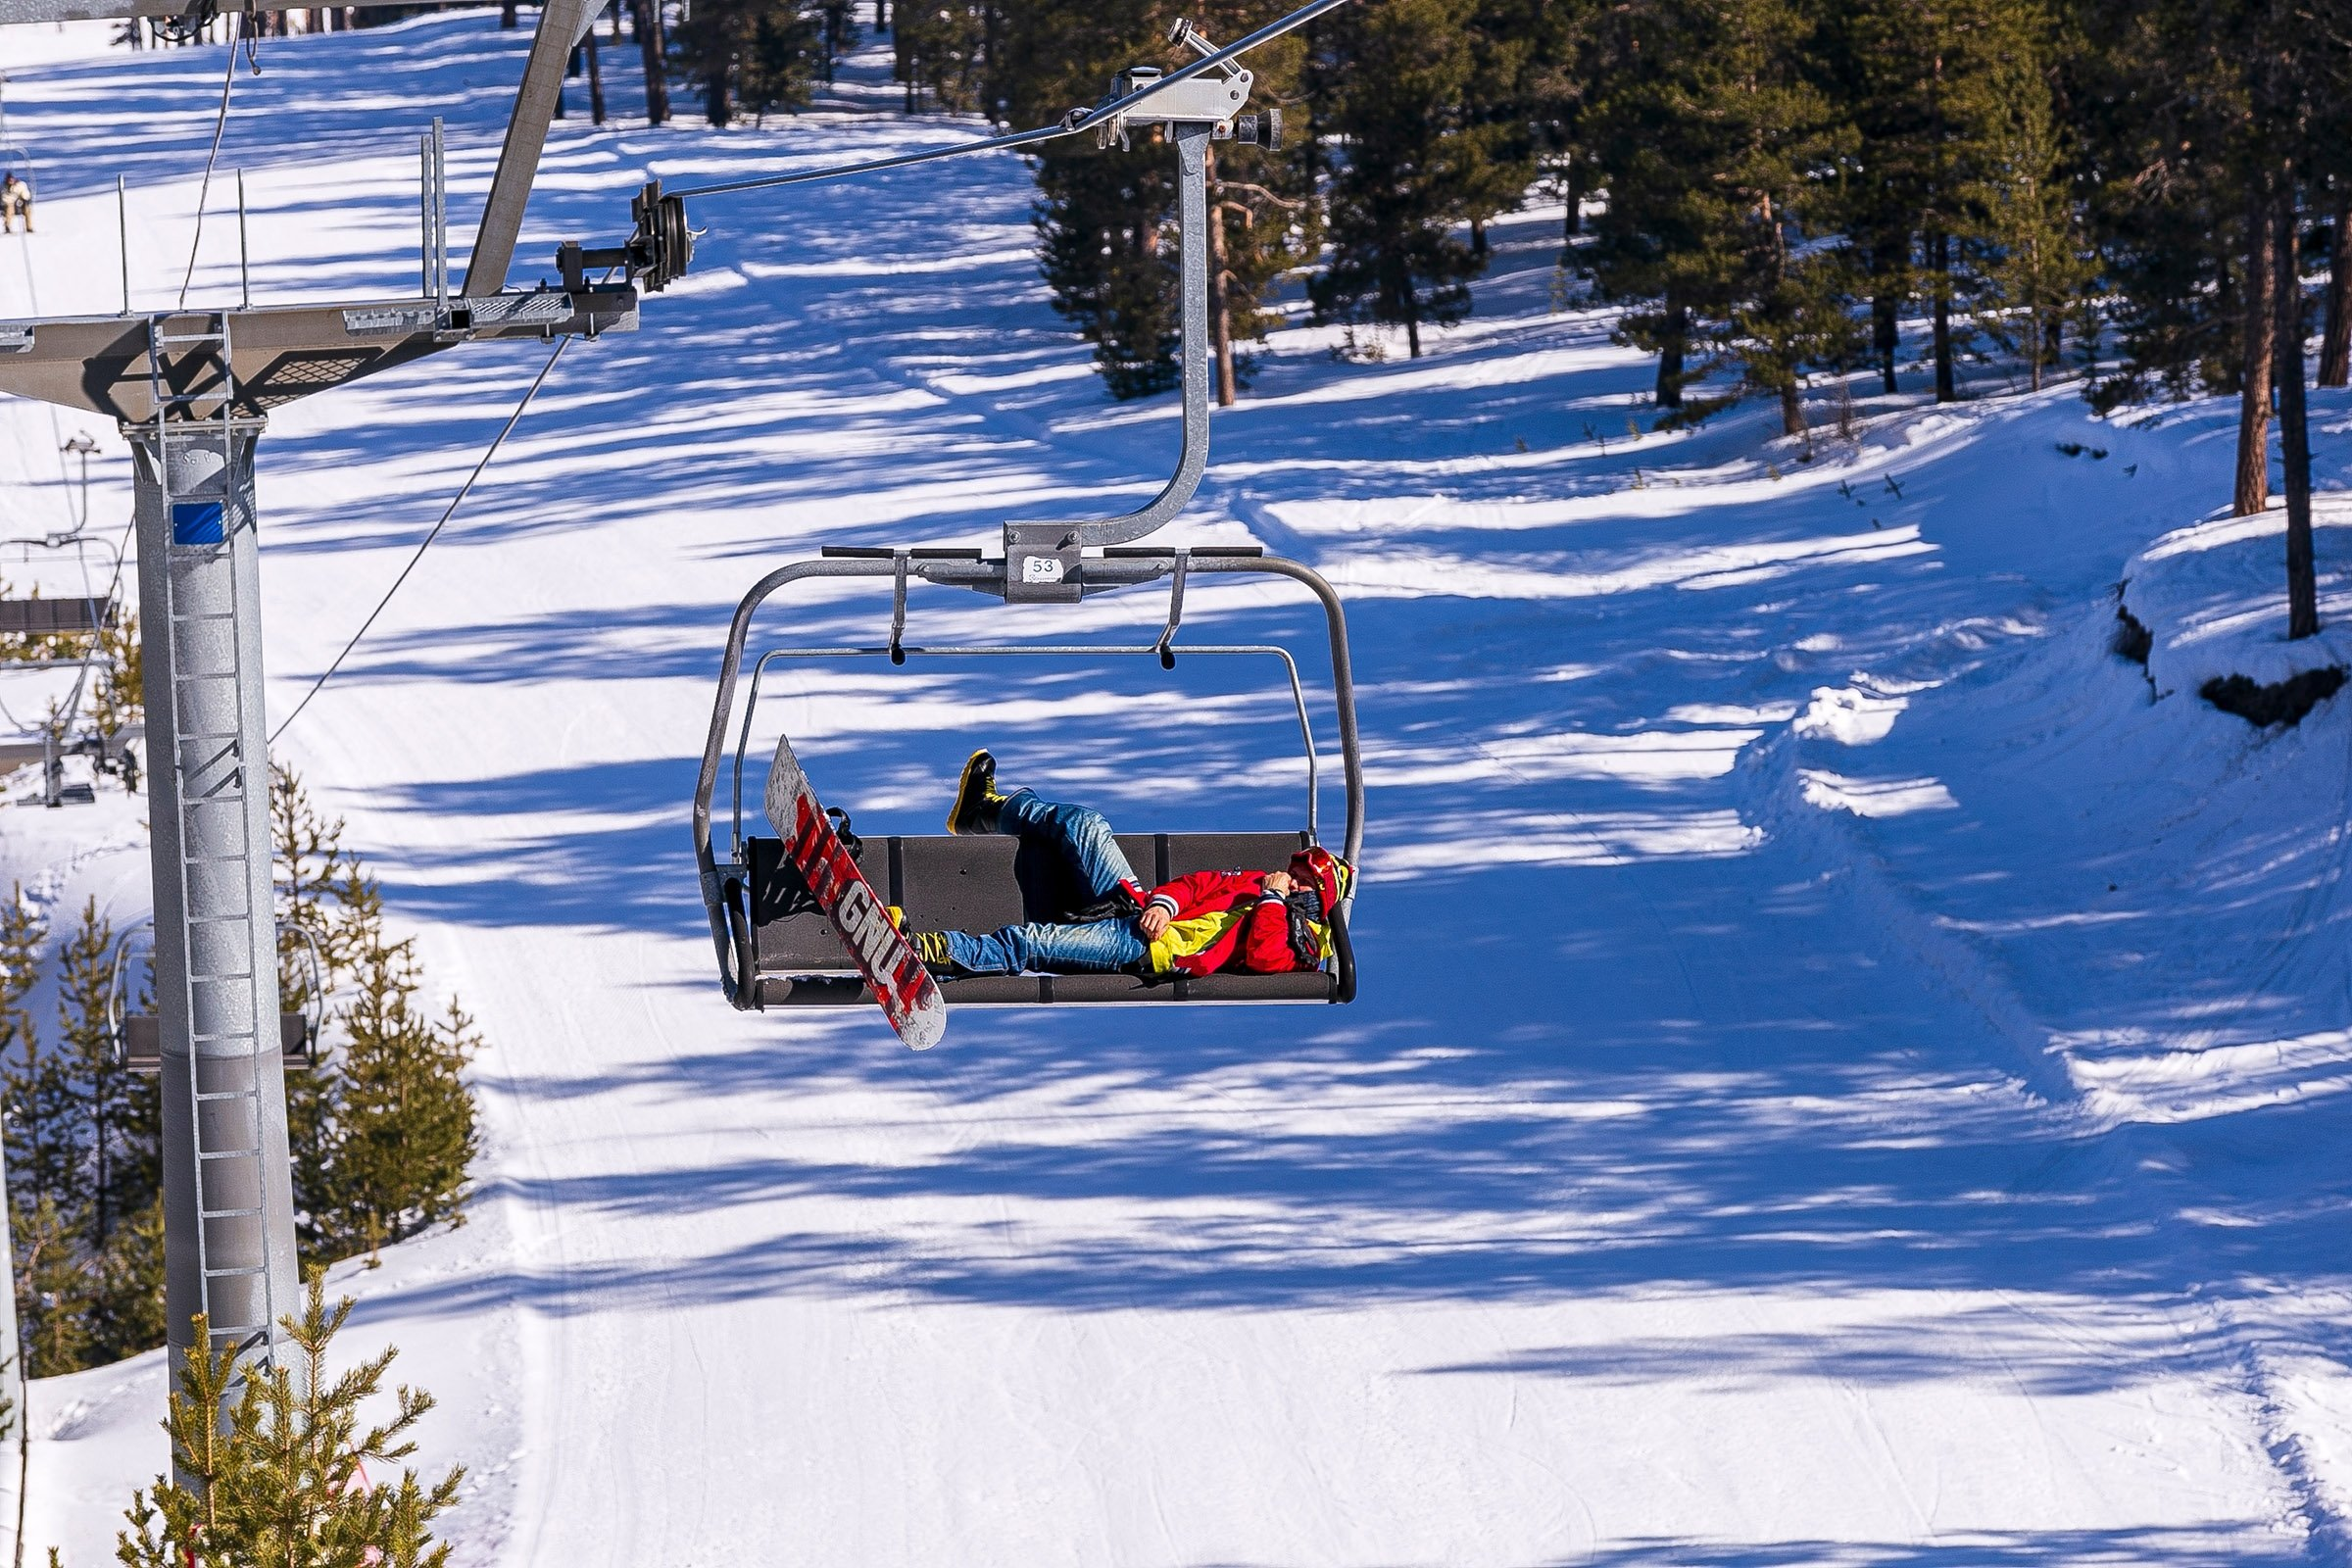 A snowboarder rests on a ski lift at Sarıkamış, Kars. (Shutterstock Photo)